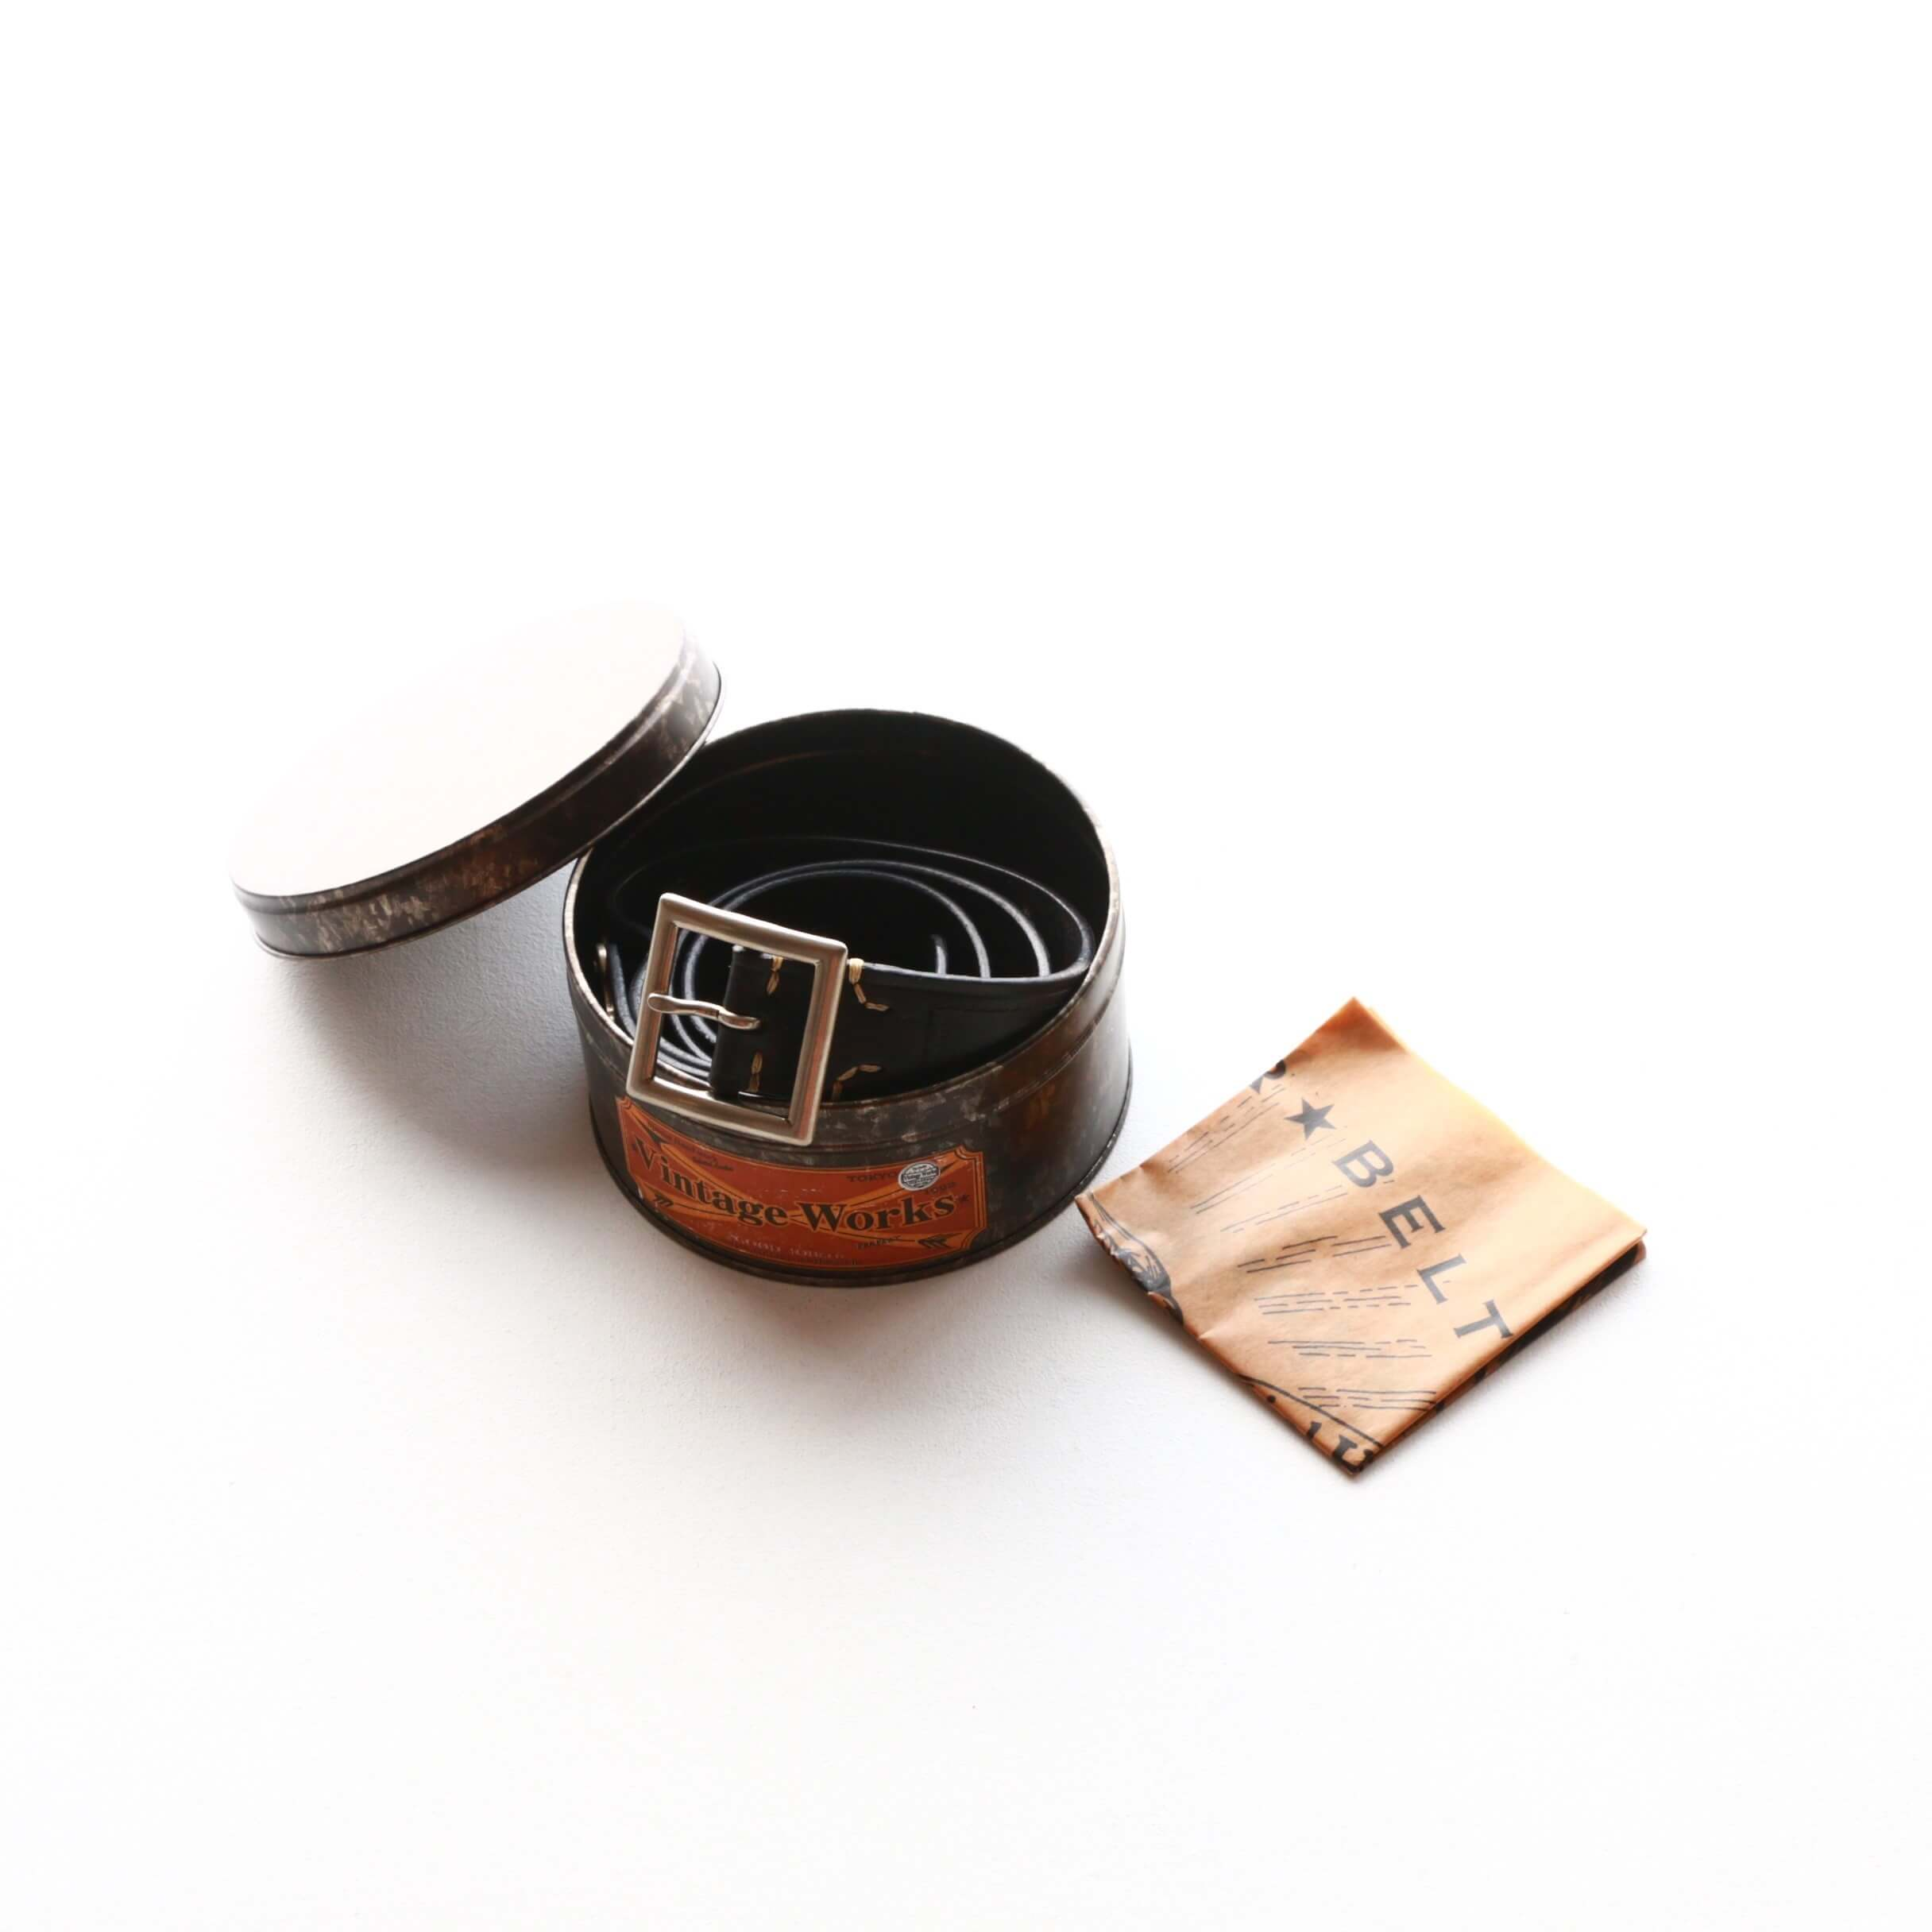 Vintage Works ヴィンテージワークス Leather belt 5Hole レザーベルト 5ホール DH5698